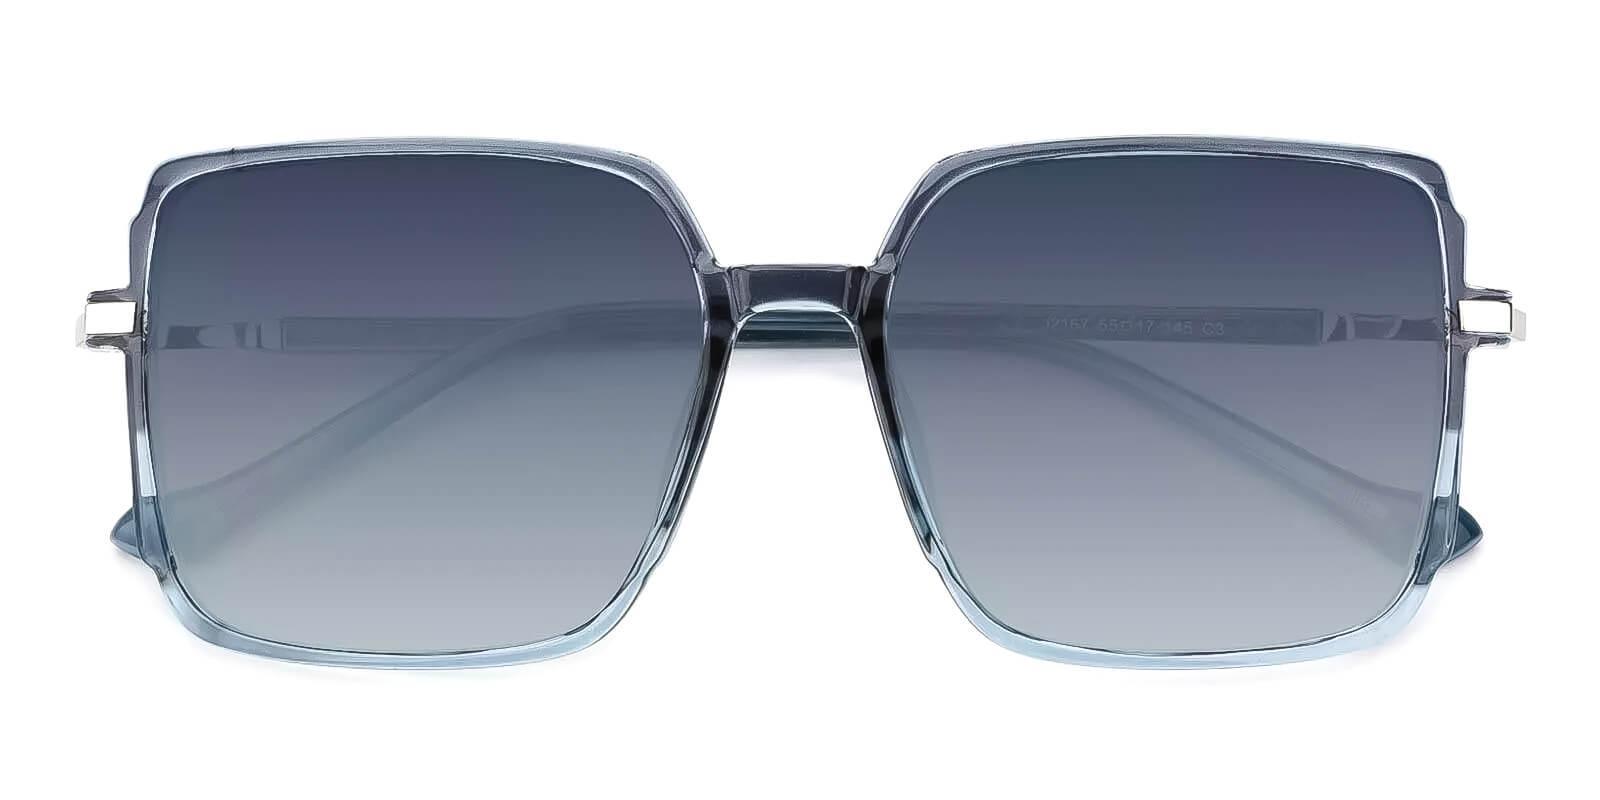 Quest Blue TR Fashion , Sunglasses , UniversalBridgeFit Frames from ABBE Glasses